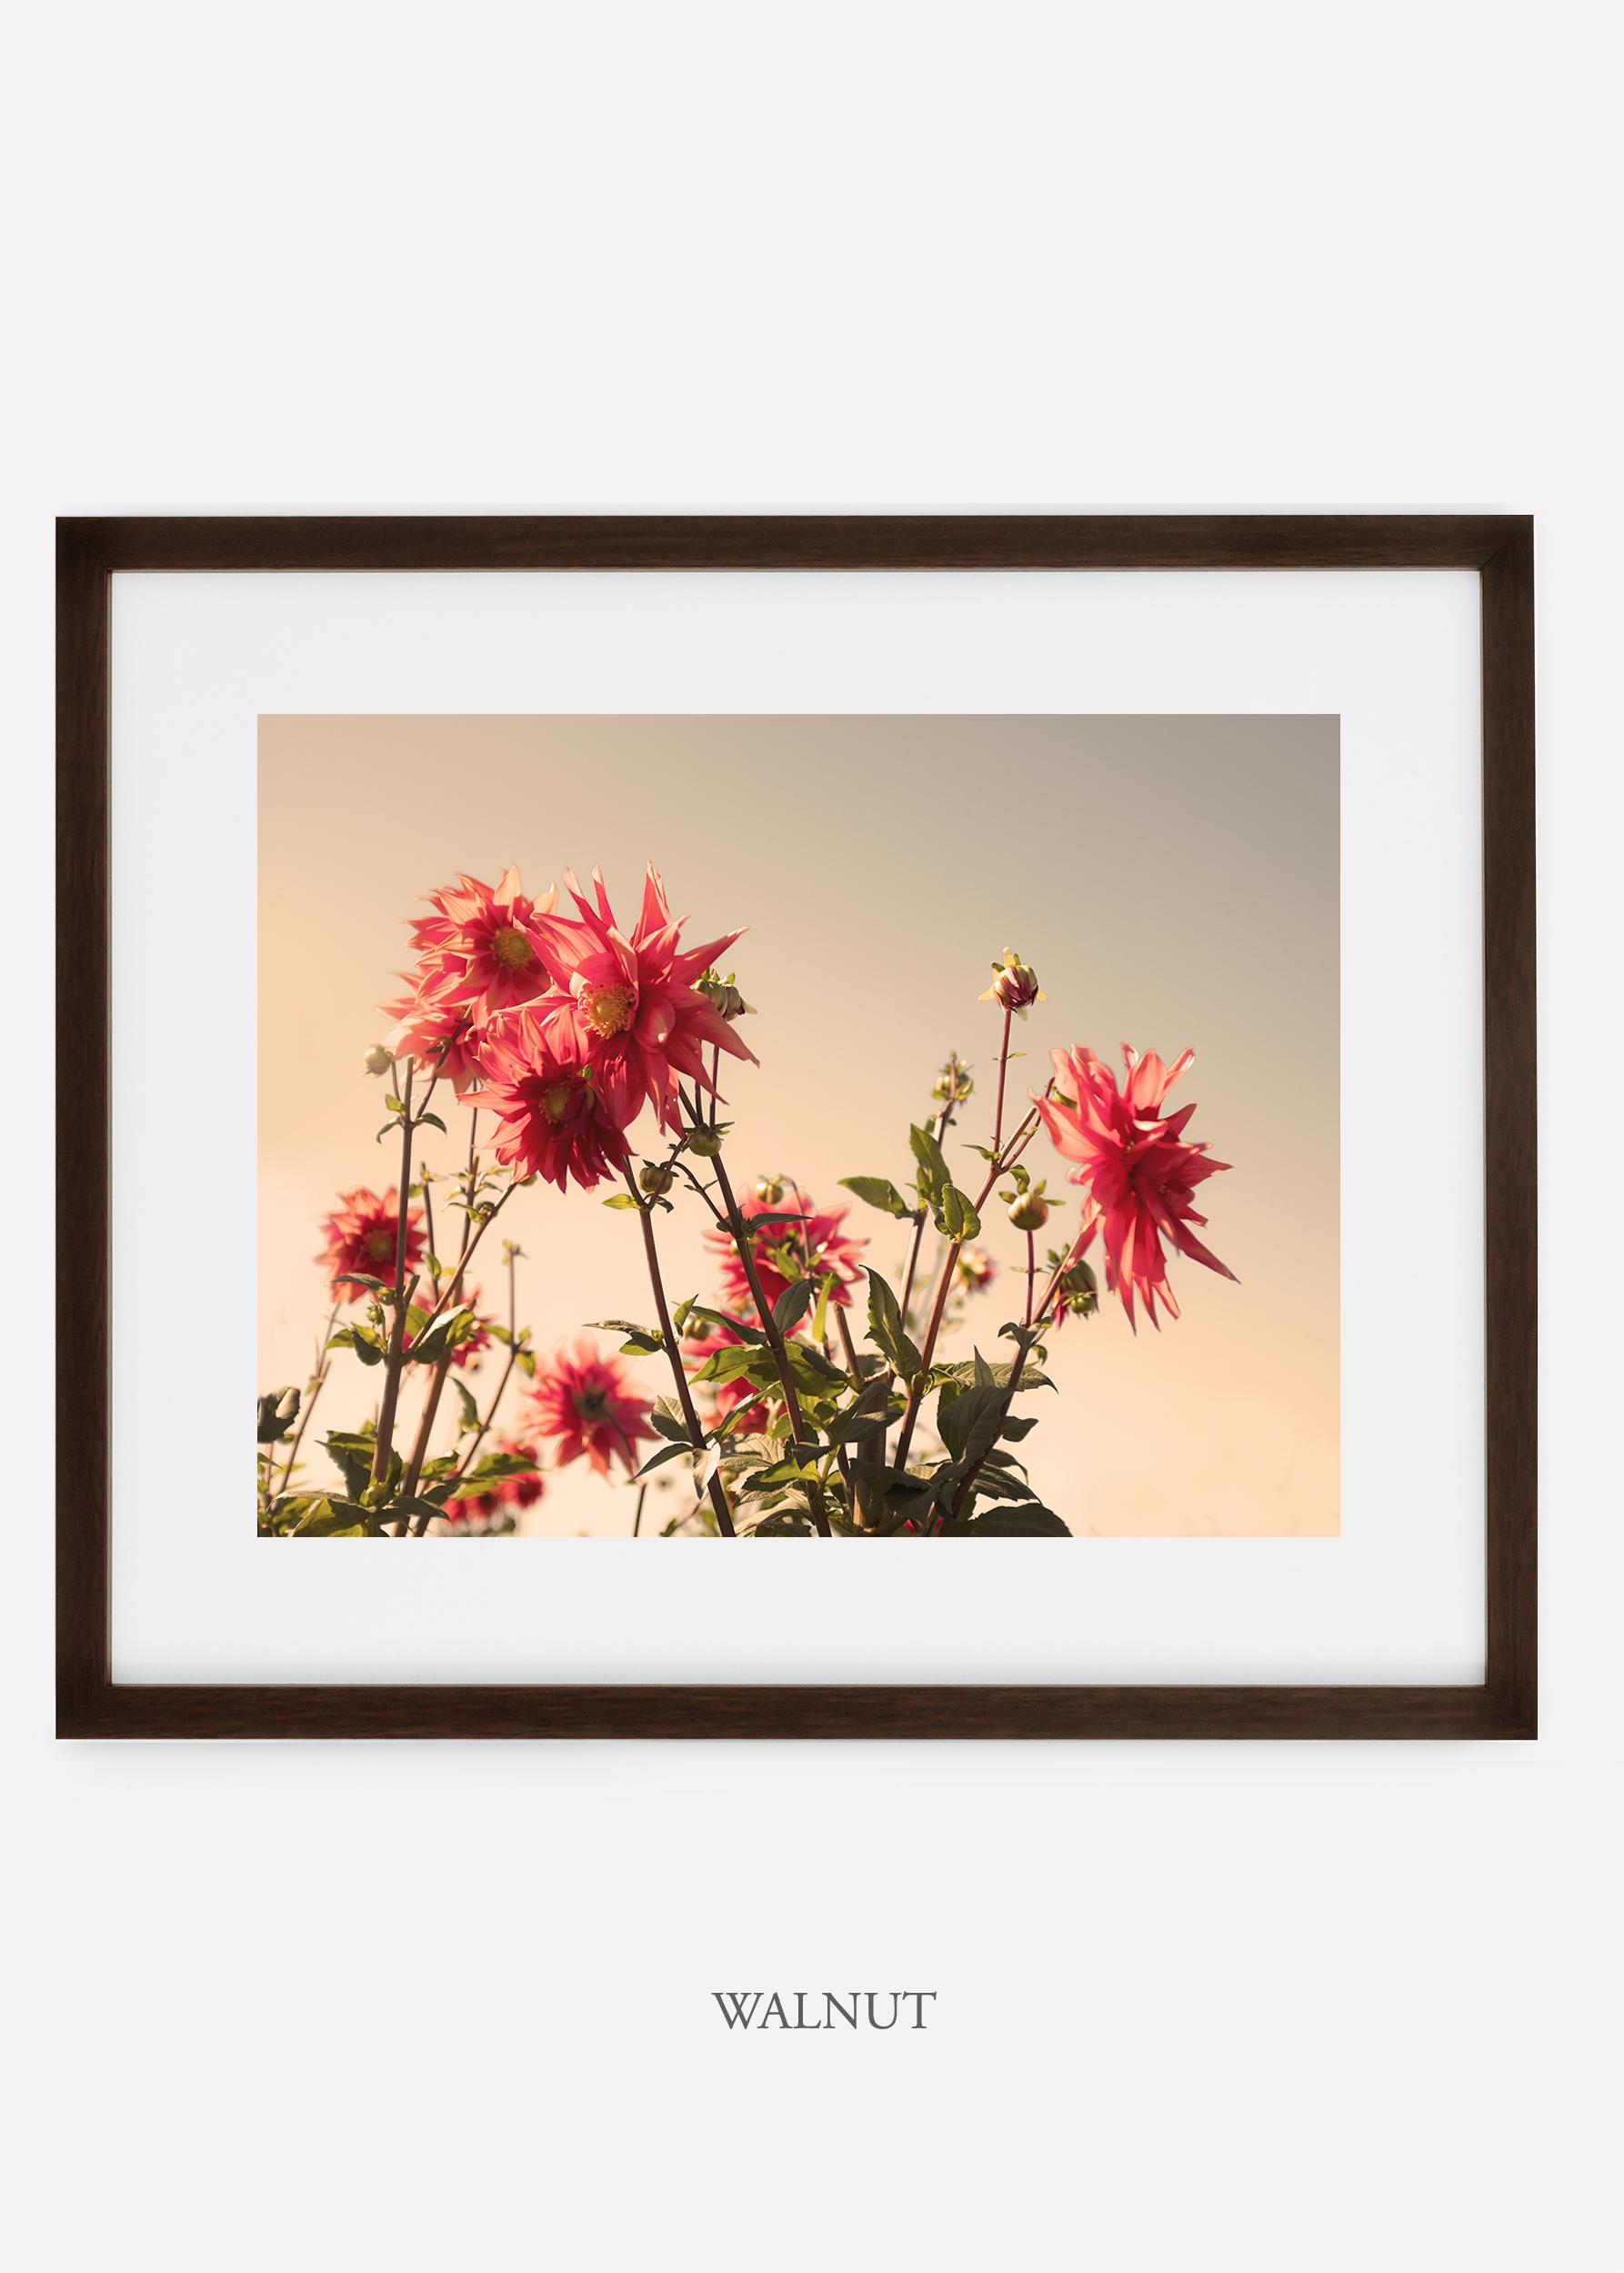 wilder-california-walnutframe-dahlia-9-minimal-botanical-print-art-interior-design.jpg